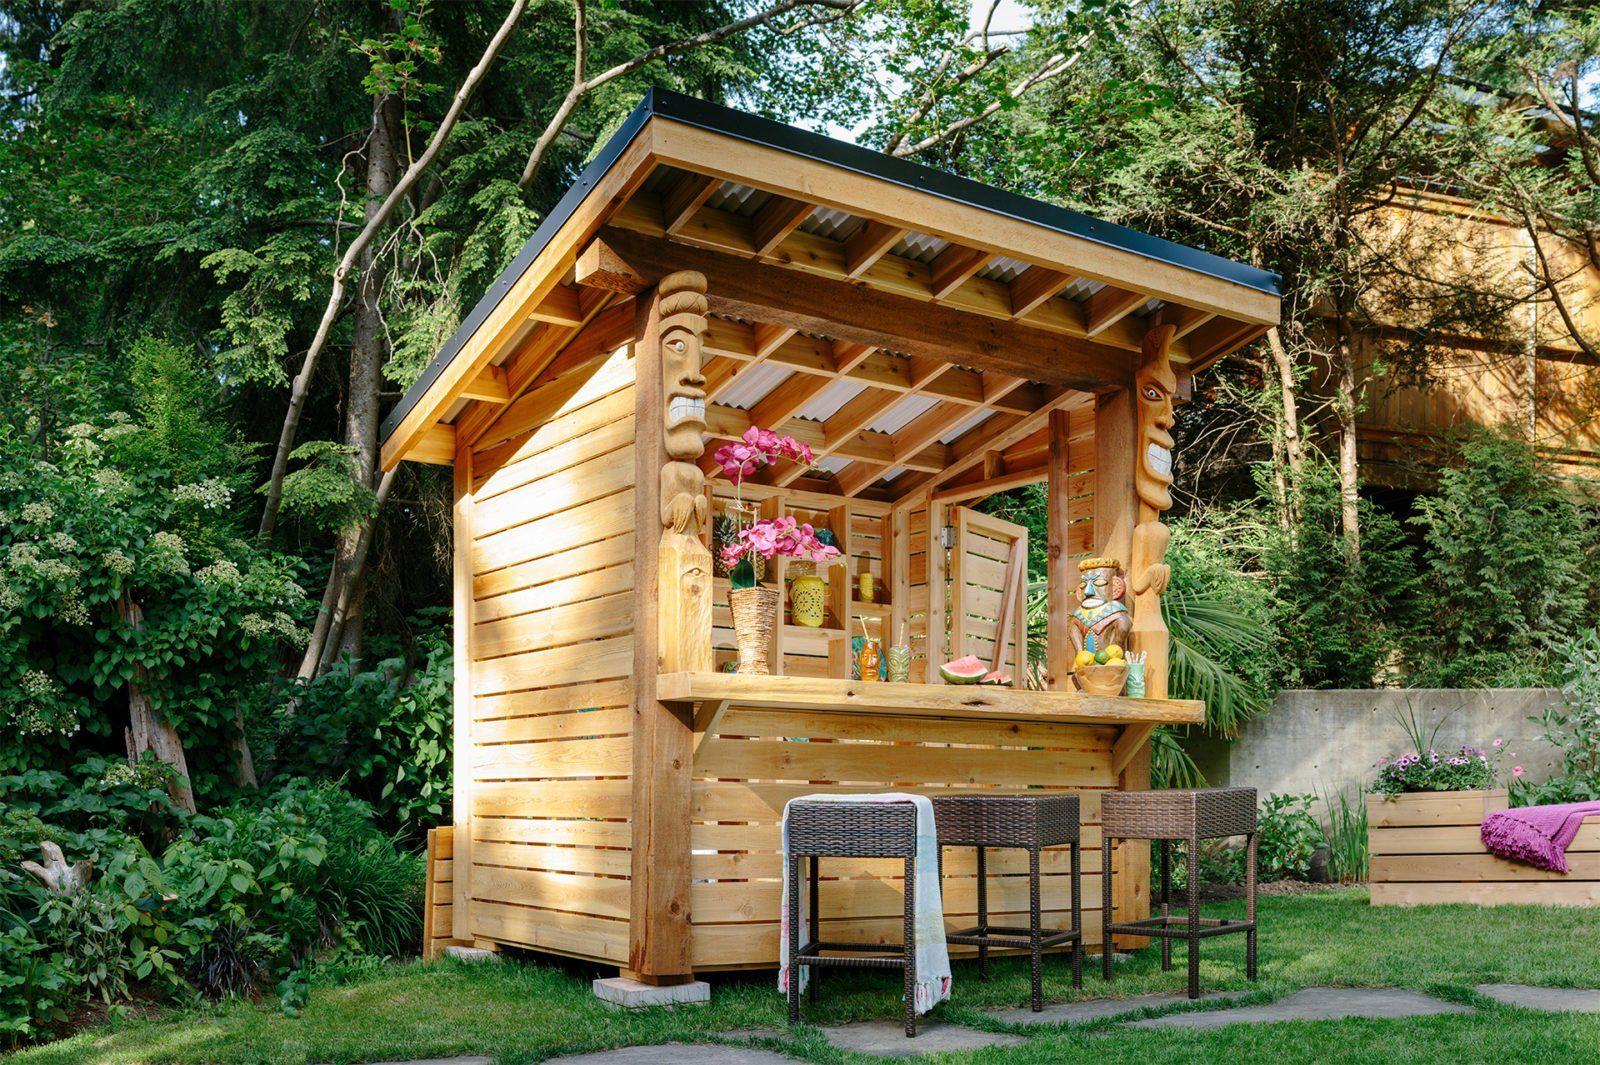 Free Tiki Bar Project Plans | Outdoor tiki bar, Diy ... on Tiki Bar Designs For Backyard id=84049